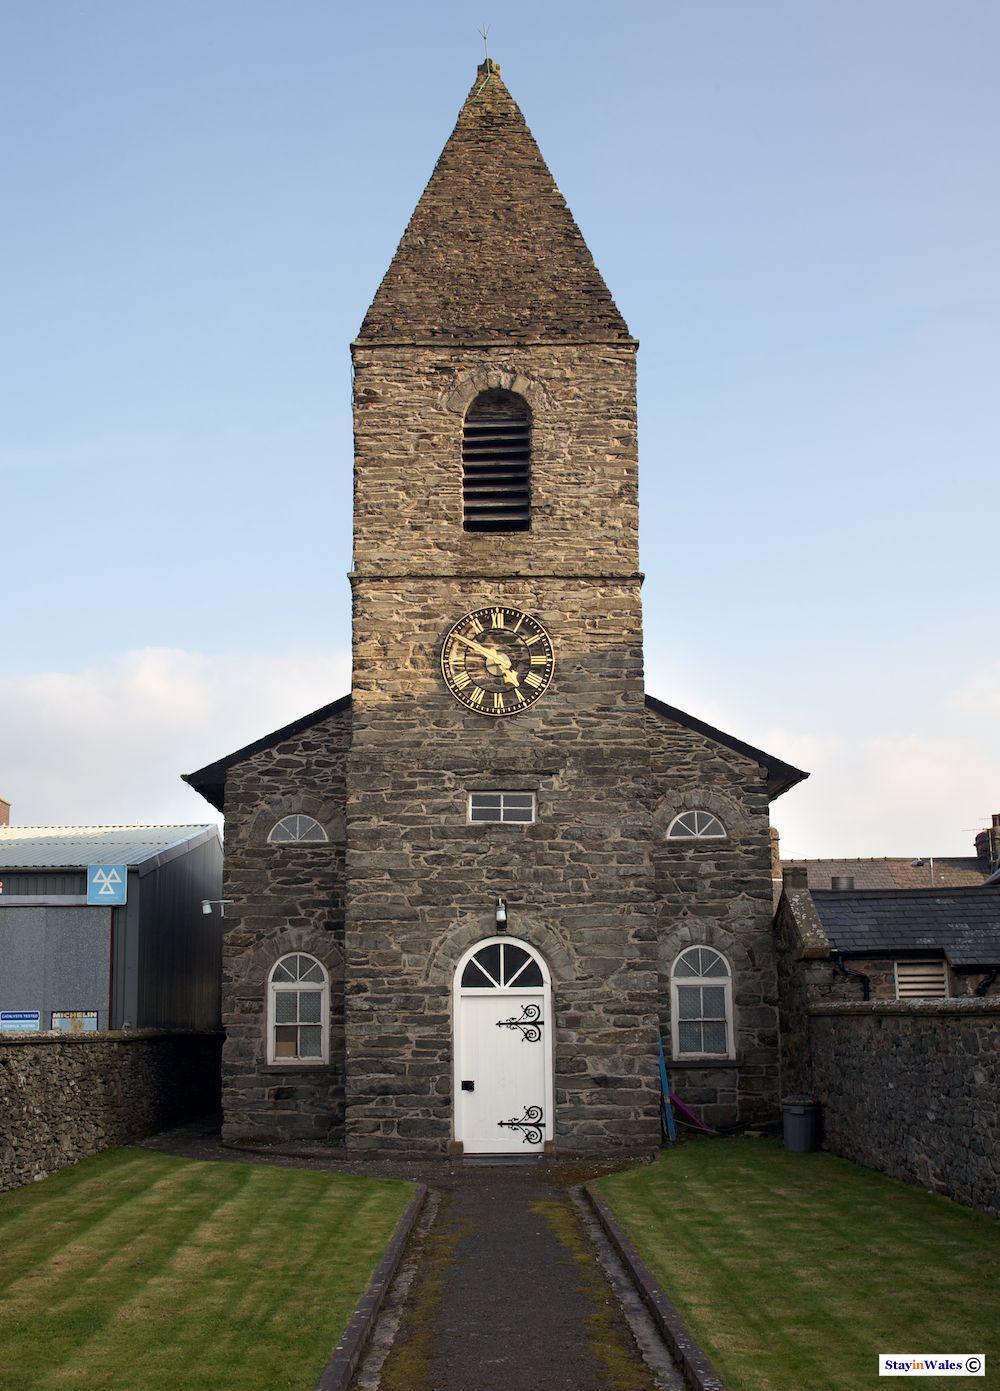 English Chapel in Bala, North Wales